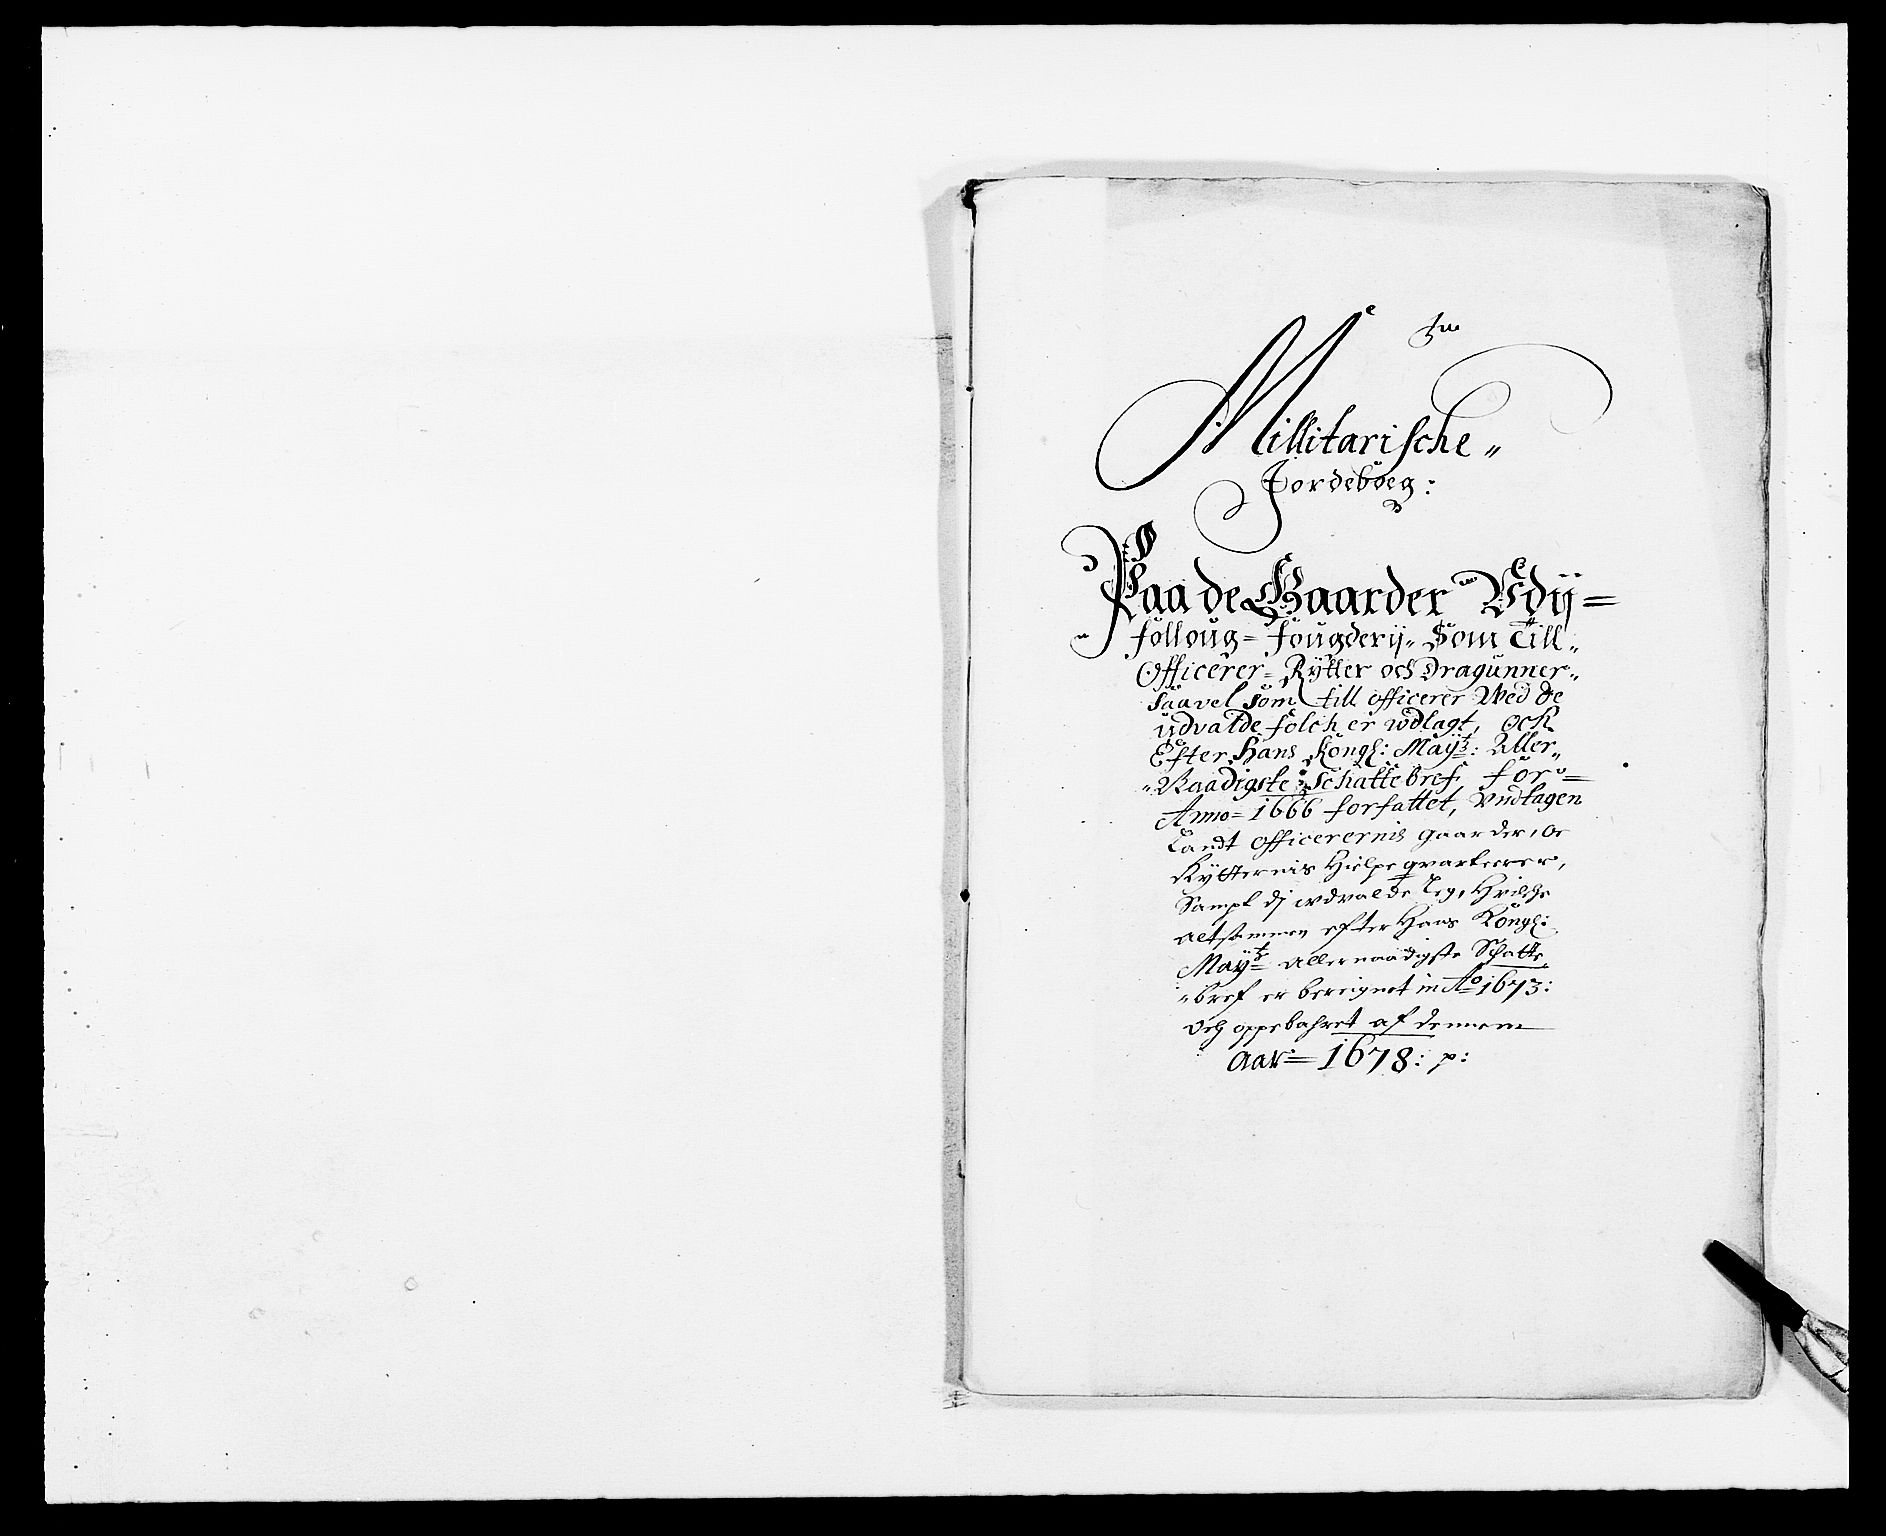 RA, Rentekammeret inntil 1814, Reviderte regnskaper, Fogderegnskap, R09/L0427: Fogderegnskap Follo, 1678, s. 223